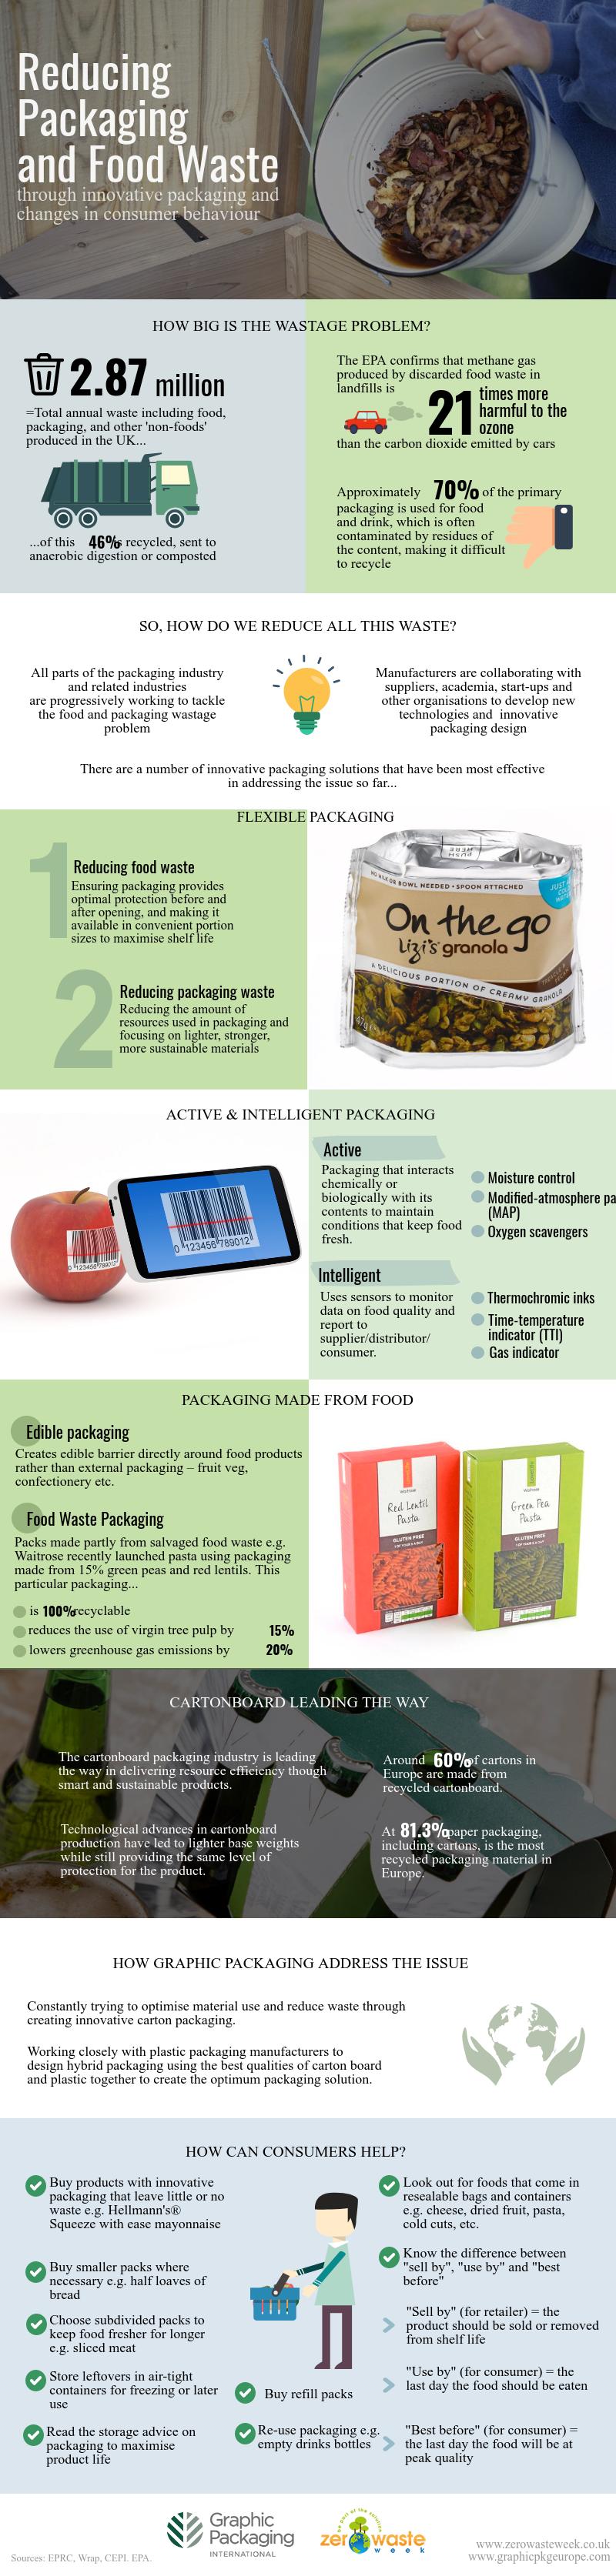 Reducing food and packaging waste